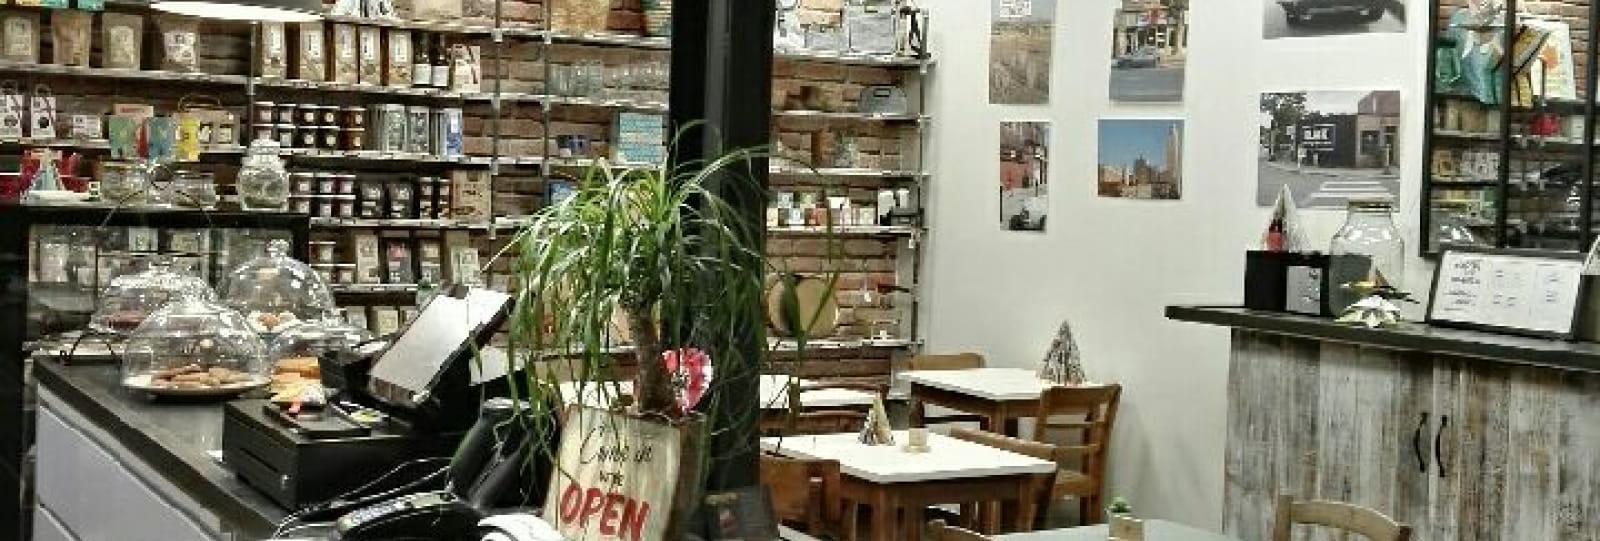 L'Echo Café